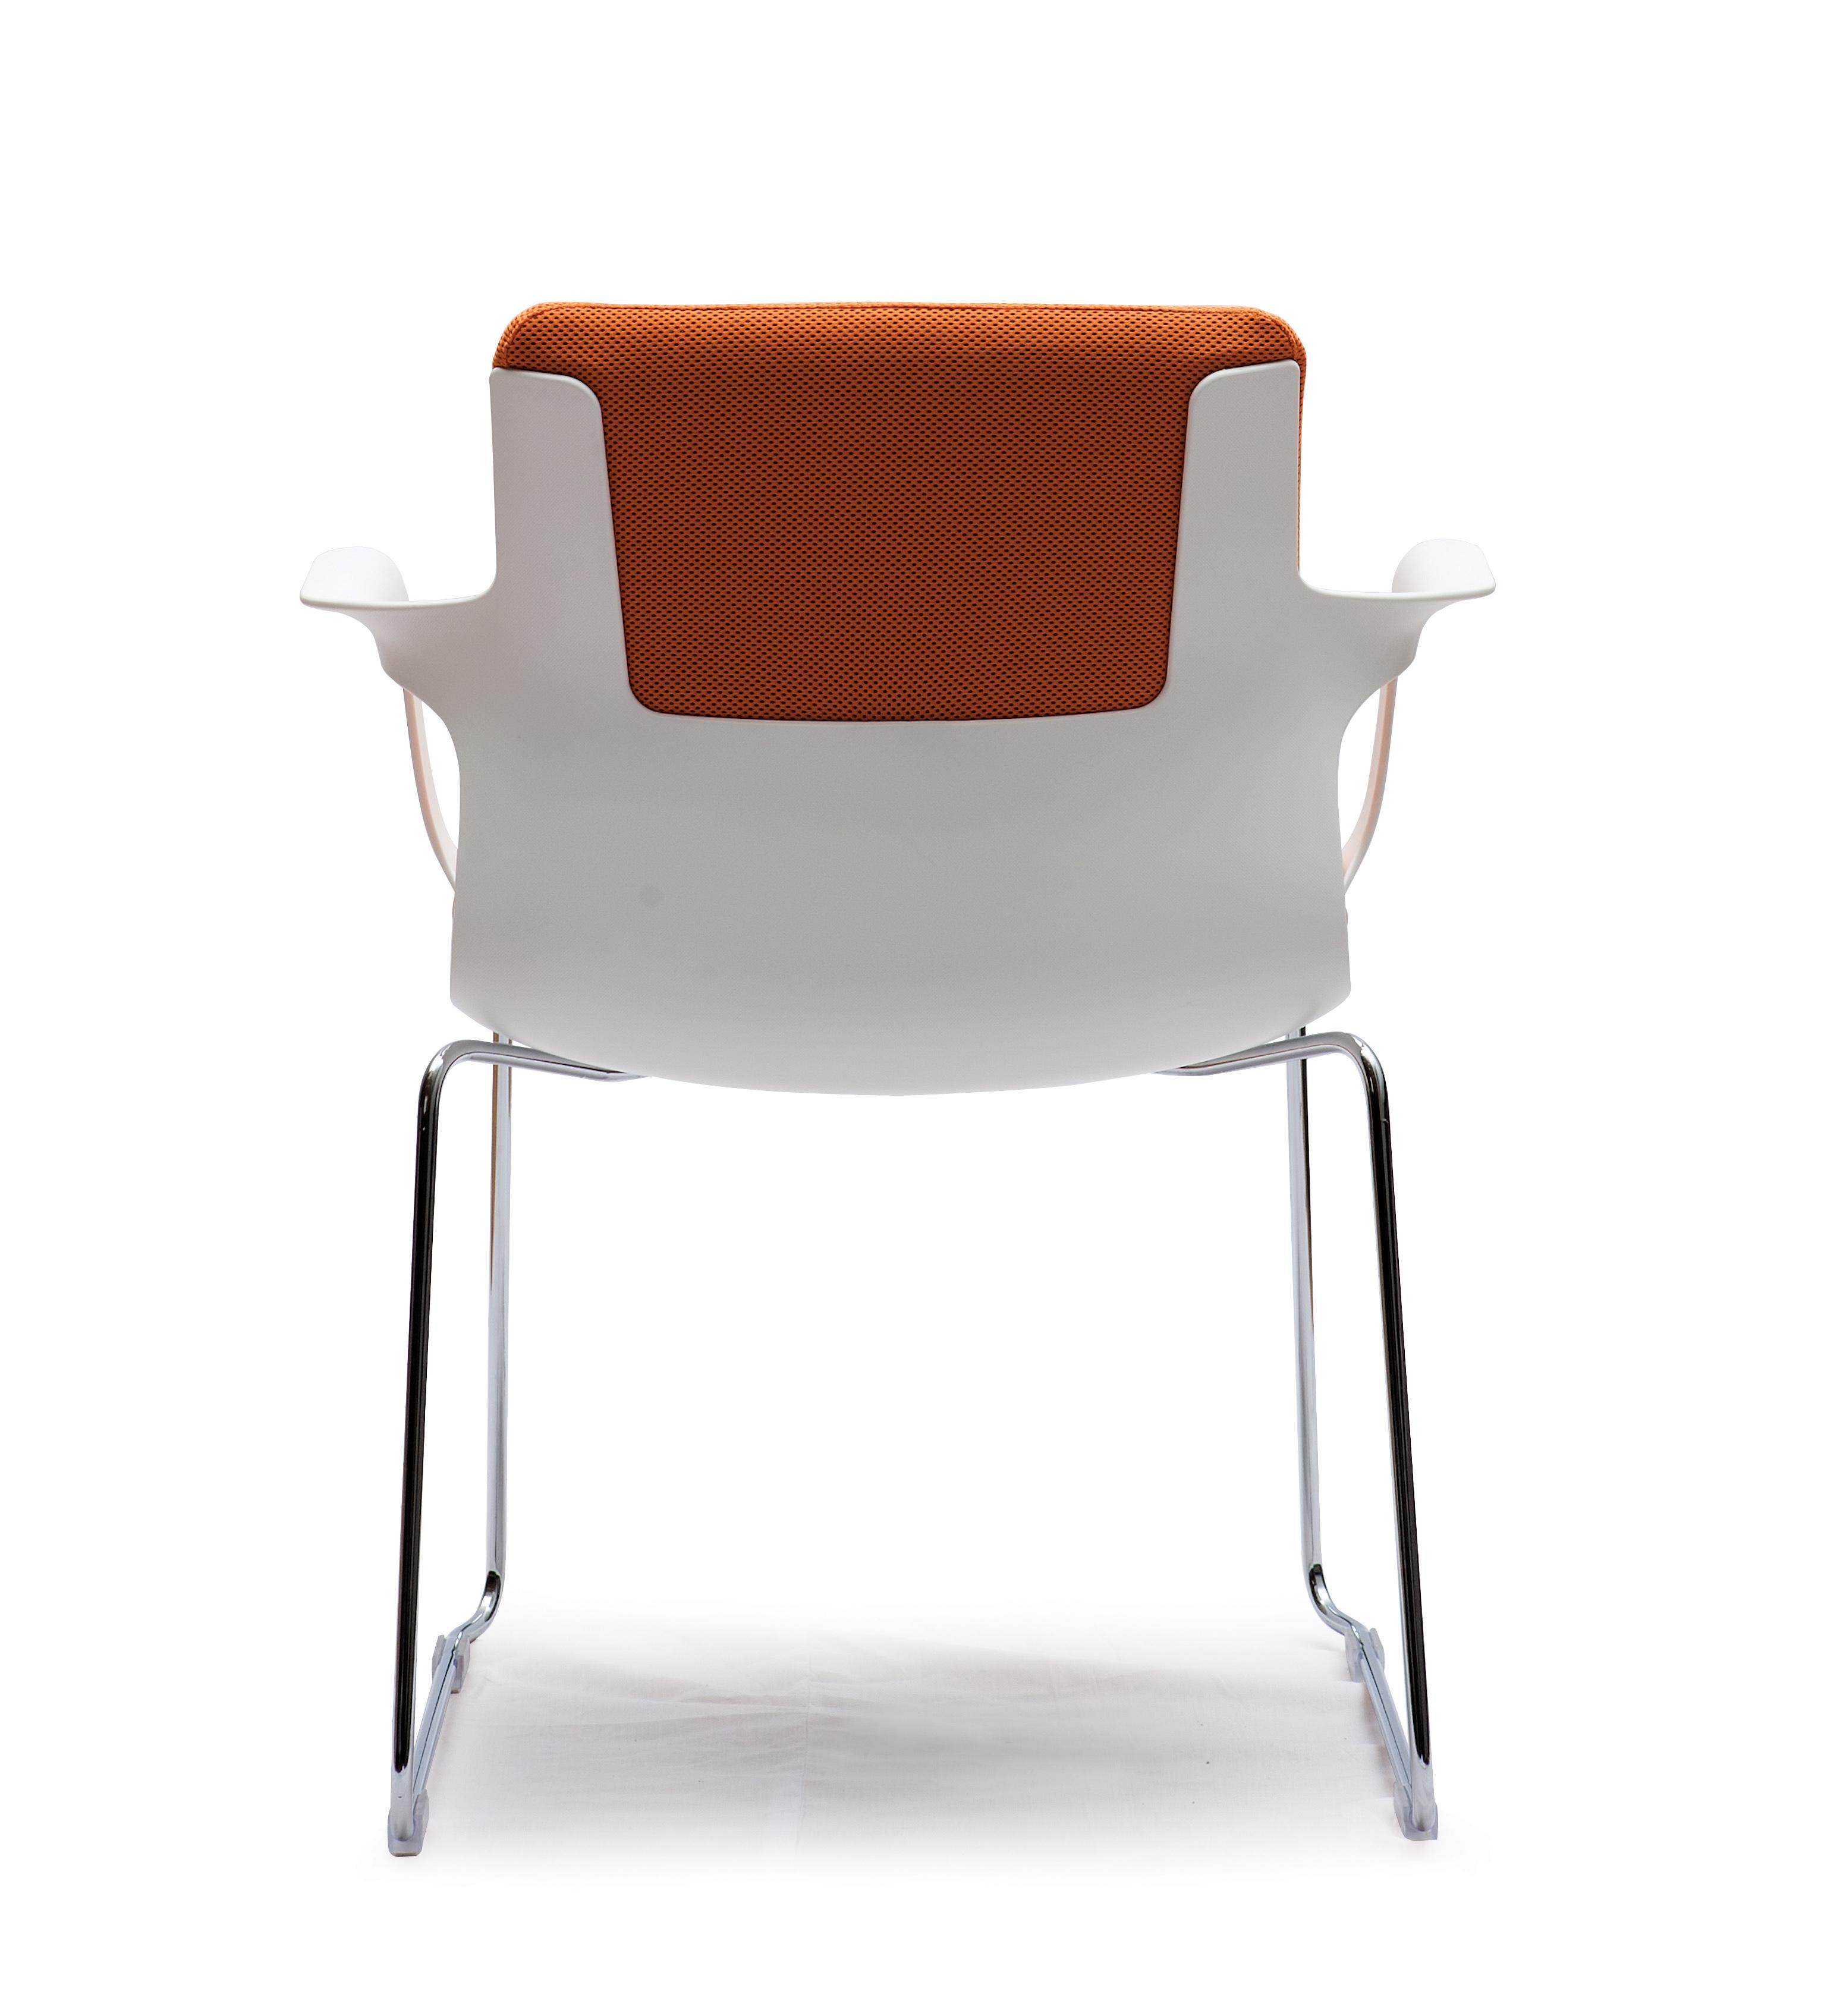 Sidiz EGA Sled Guest Chair